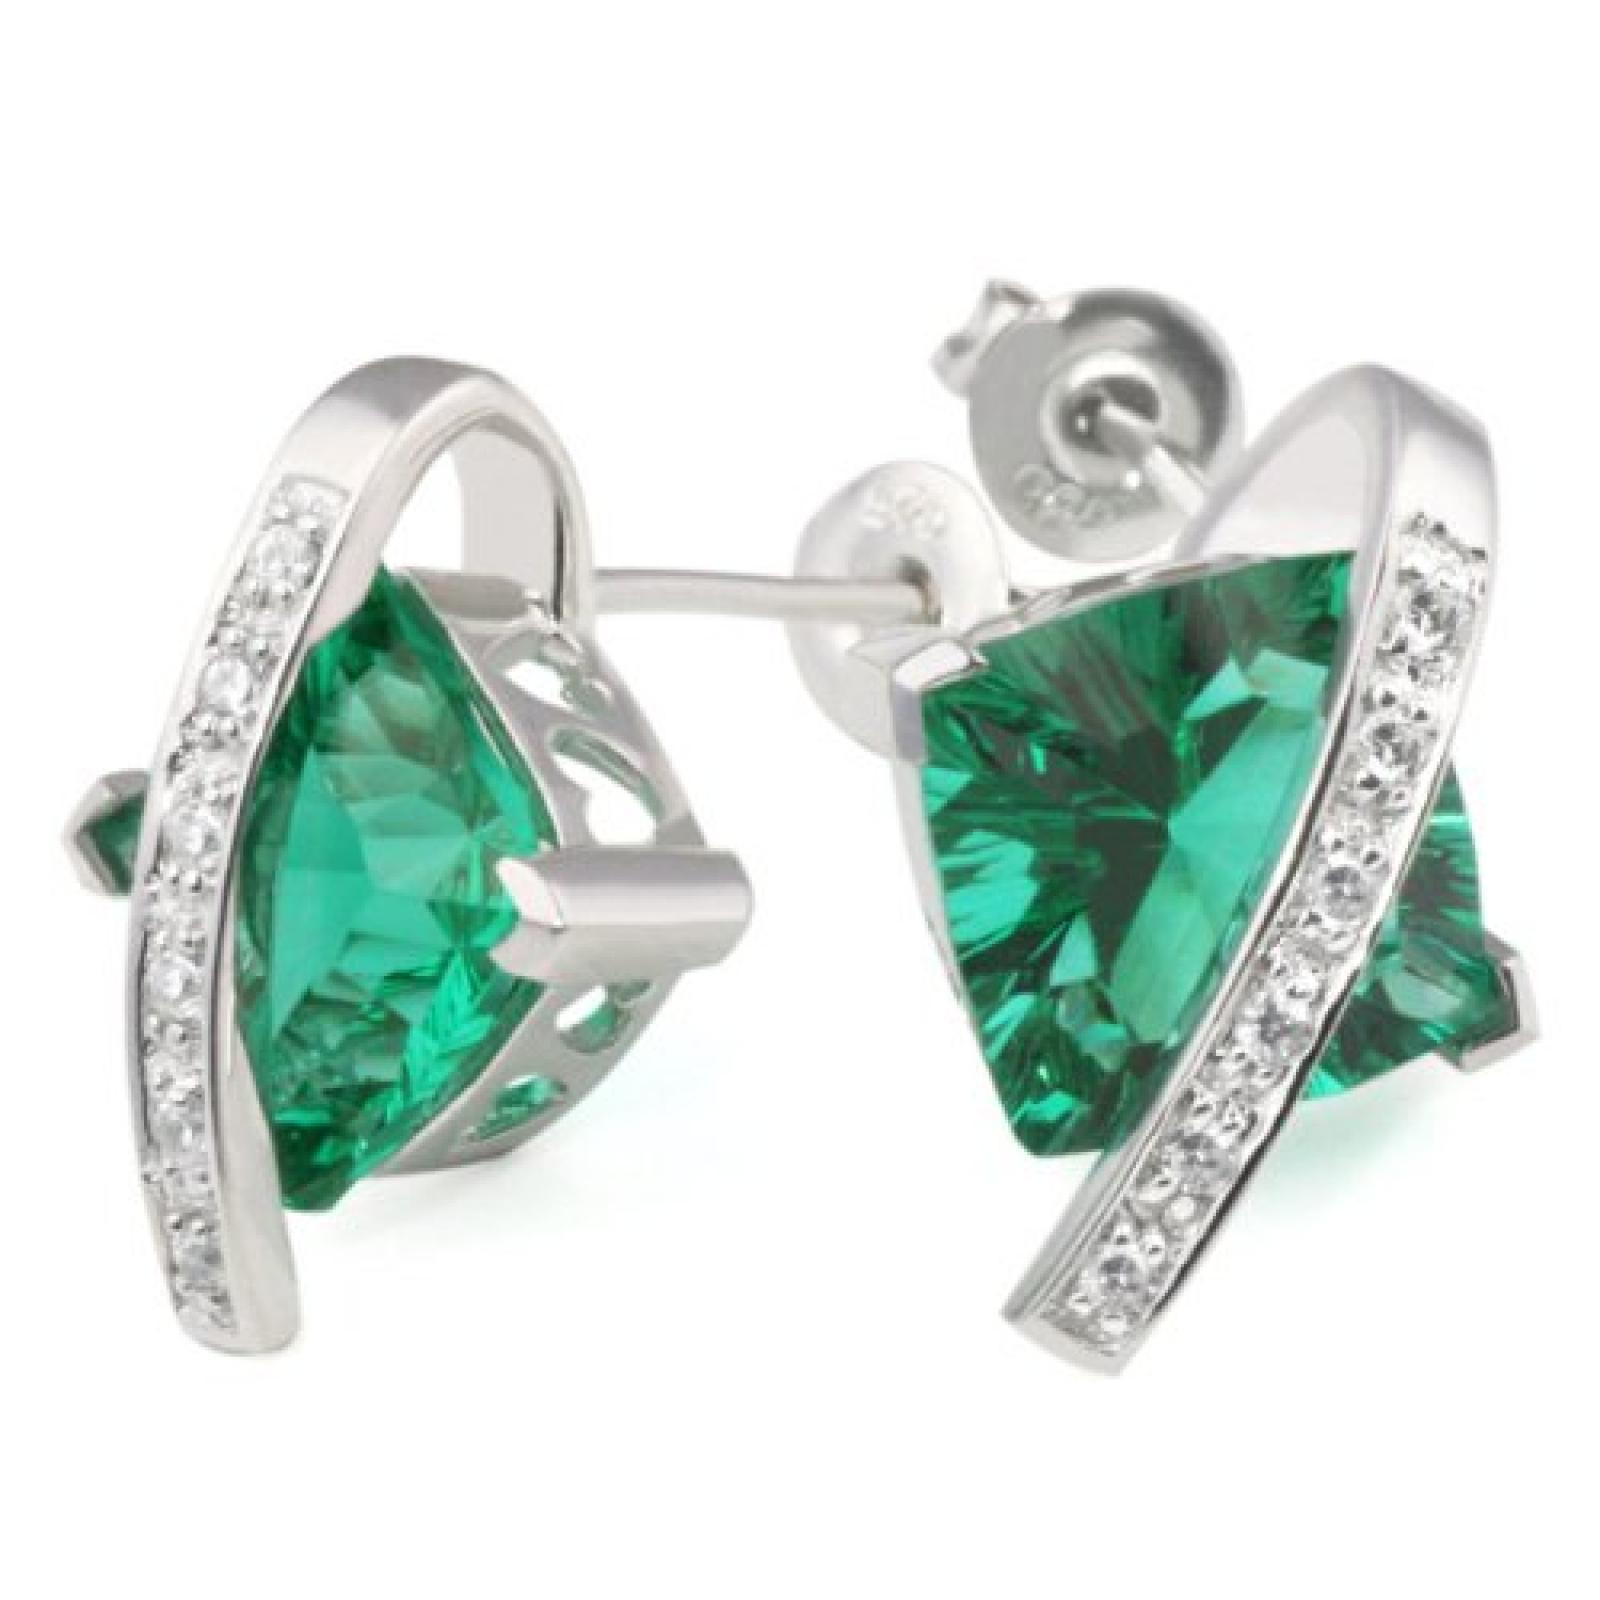 Goldmaid Damen-Ohrstecker smaragdgrün 925 Sterlingsilber Zirkonia weiß Fa O25605S